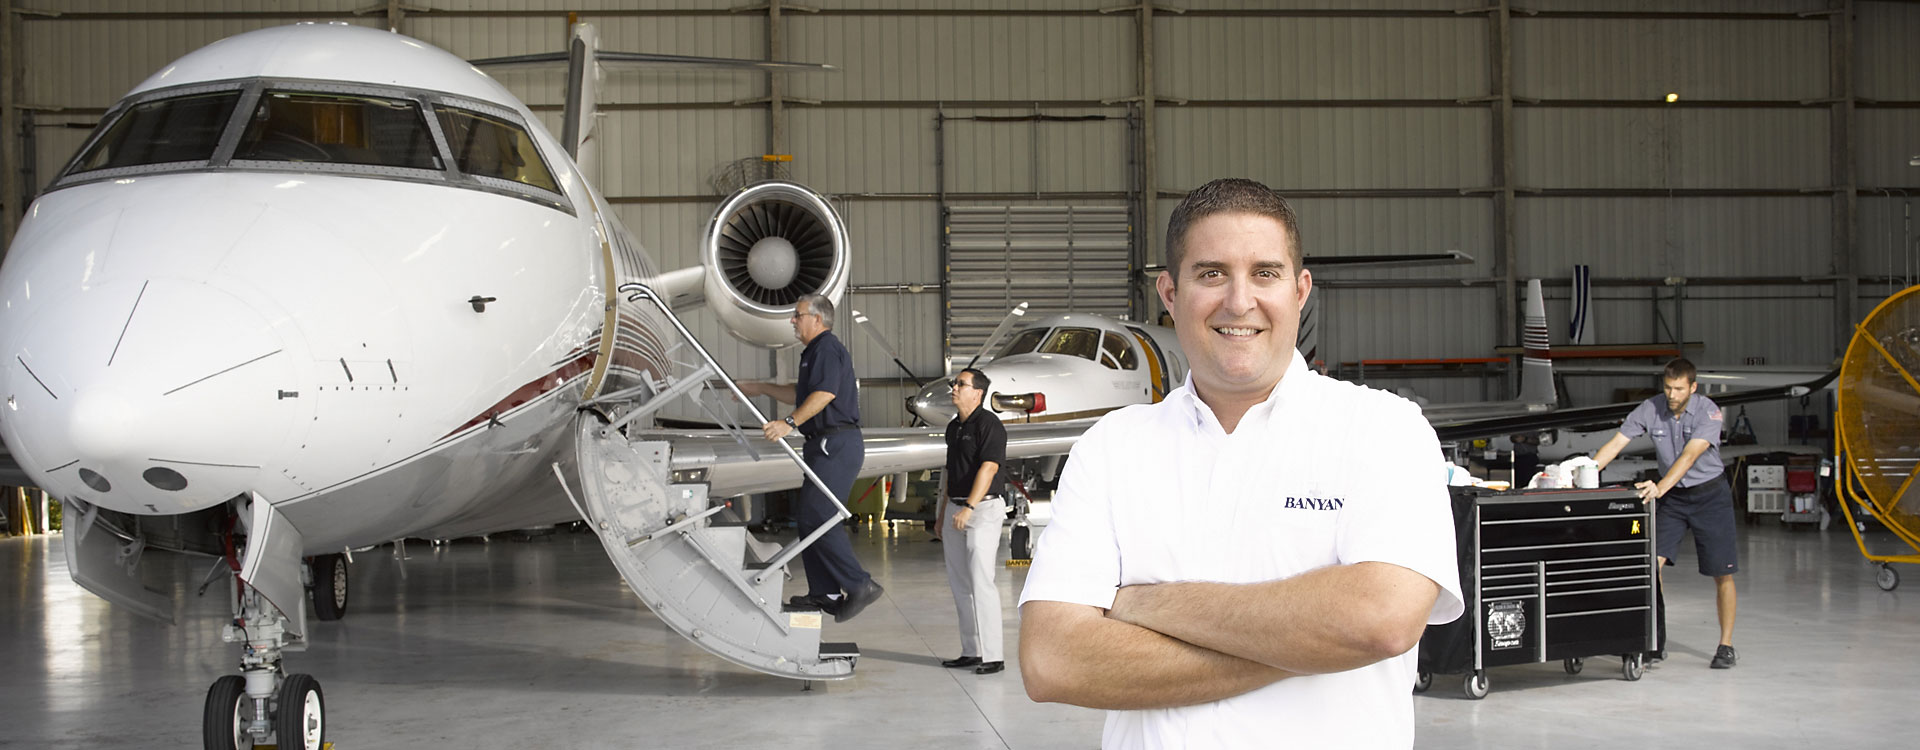 Aircraft Maintenance Charlie Amento